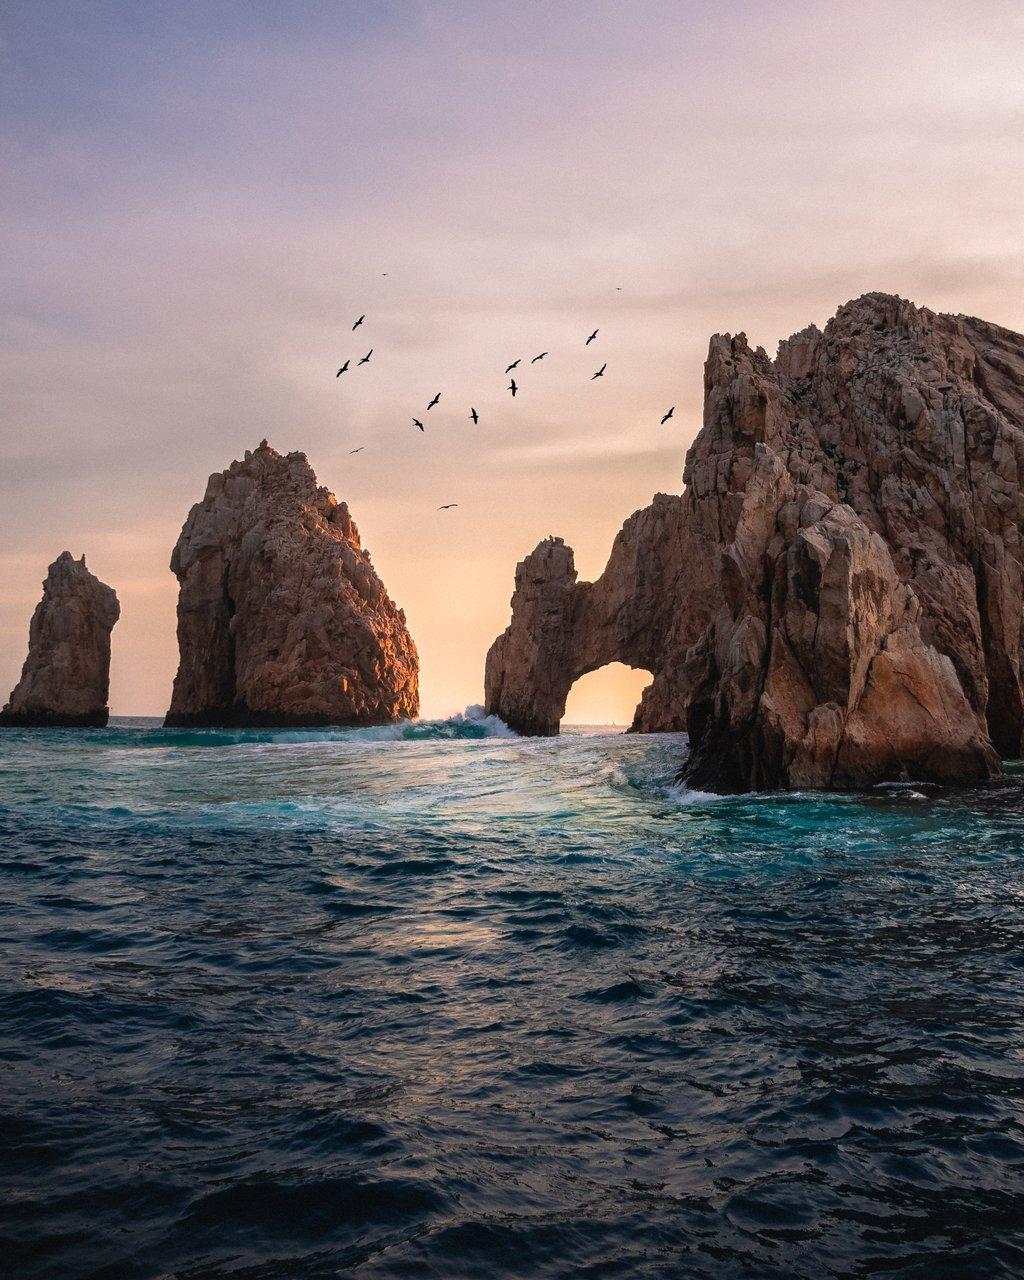 Mexico_Photo_by_Christopher_Kuzman_on_Unsplash.jpg?1619647263